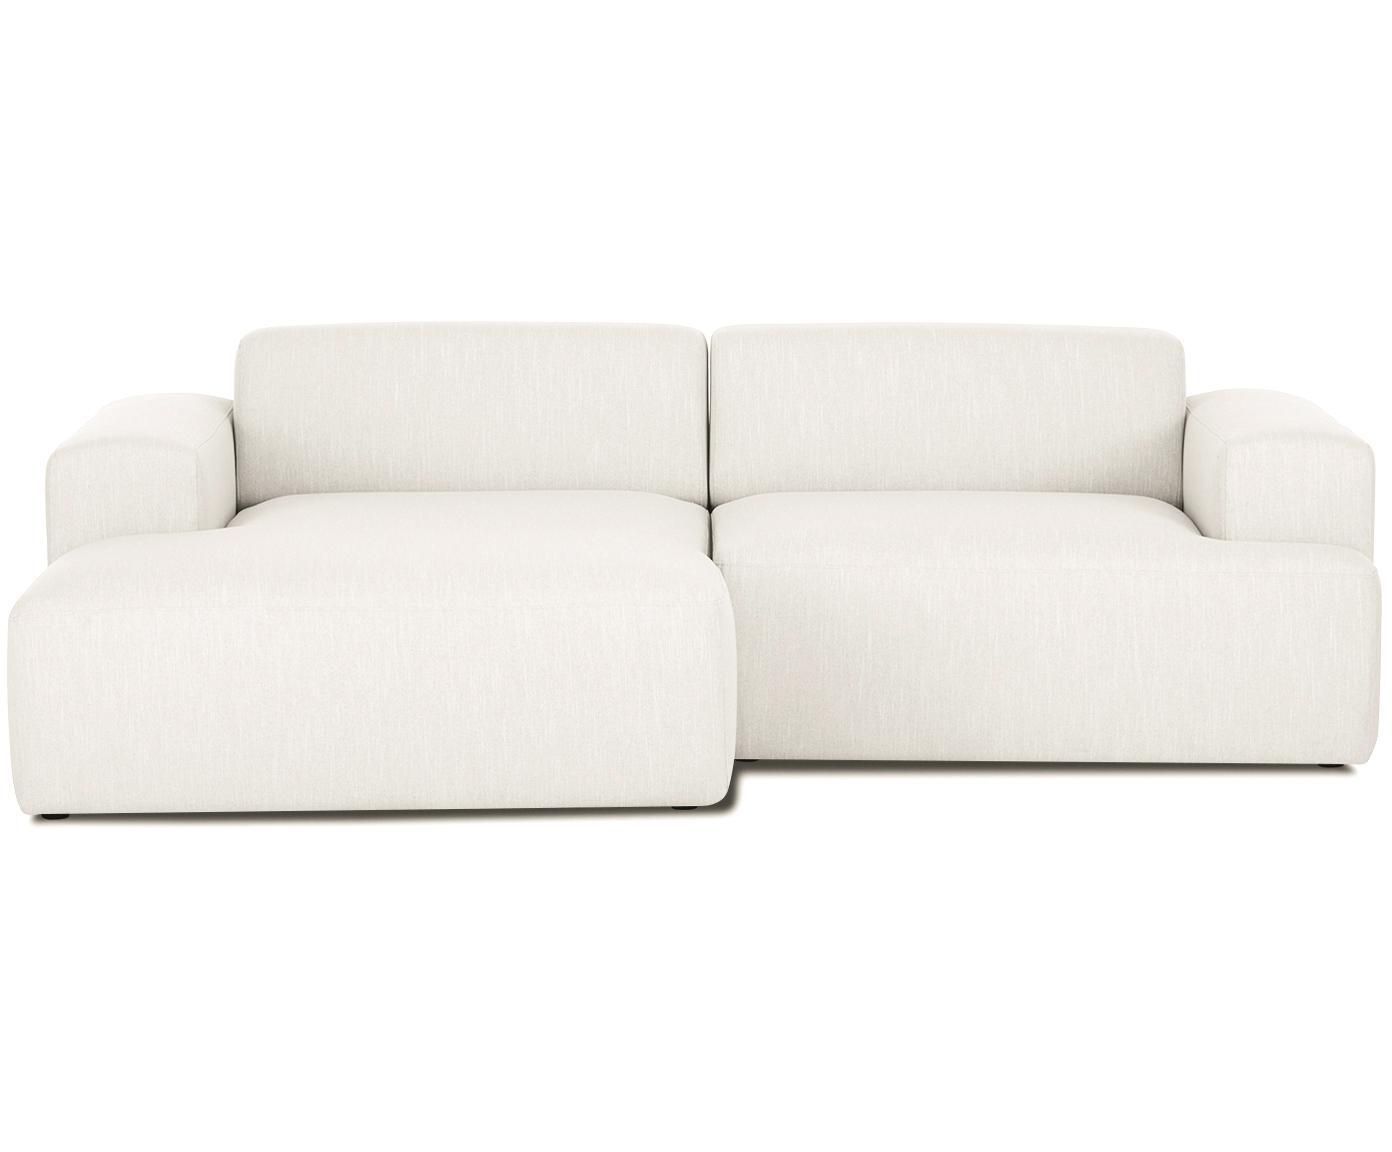 Ecksofa Melva (3-Sitzer), Bezug: Polyester Der hochwertige, Gestell: Massives Kiefernholz, Spa, Füße: Kiefernholz, Webstoff Beige, B 240 x T 144 cm